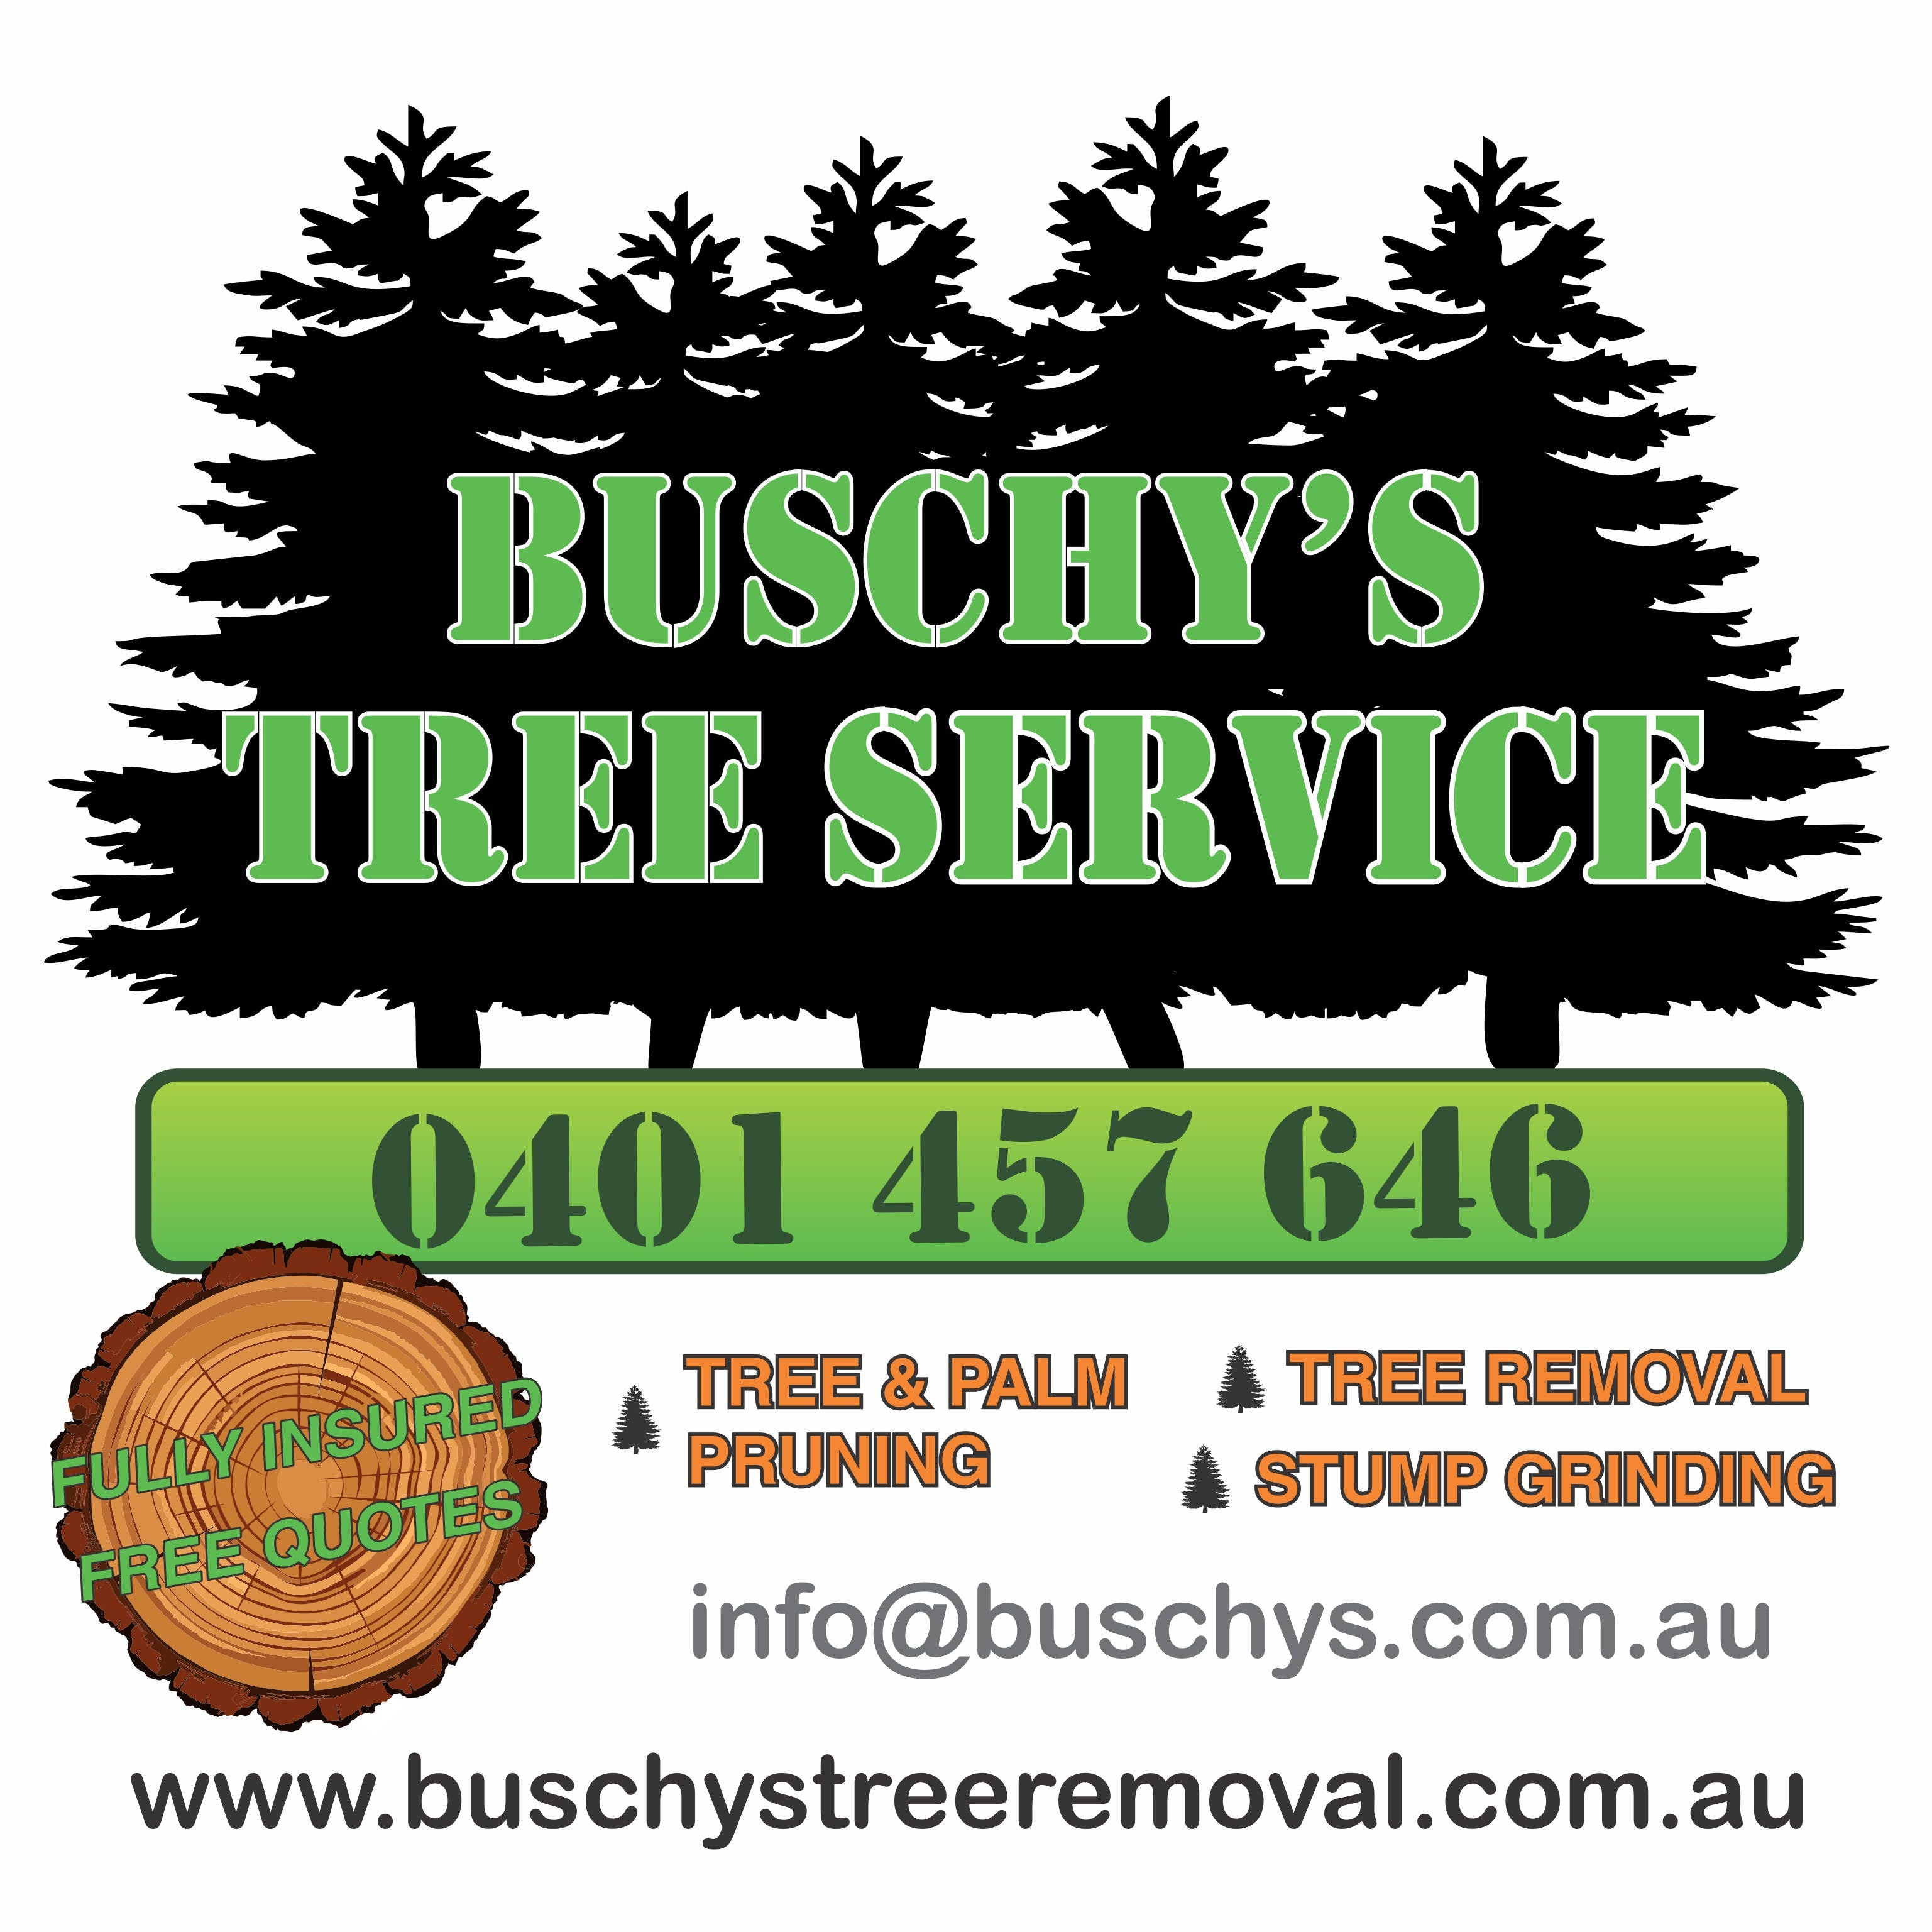 Buschy's Tree Service